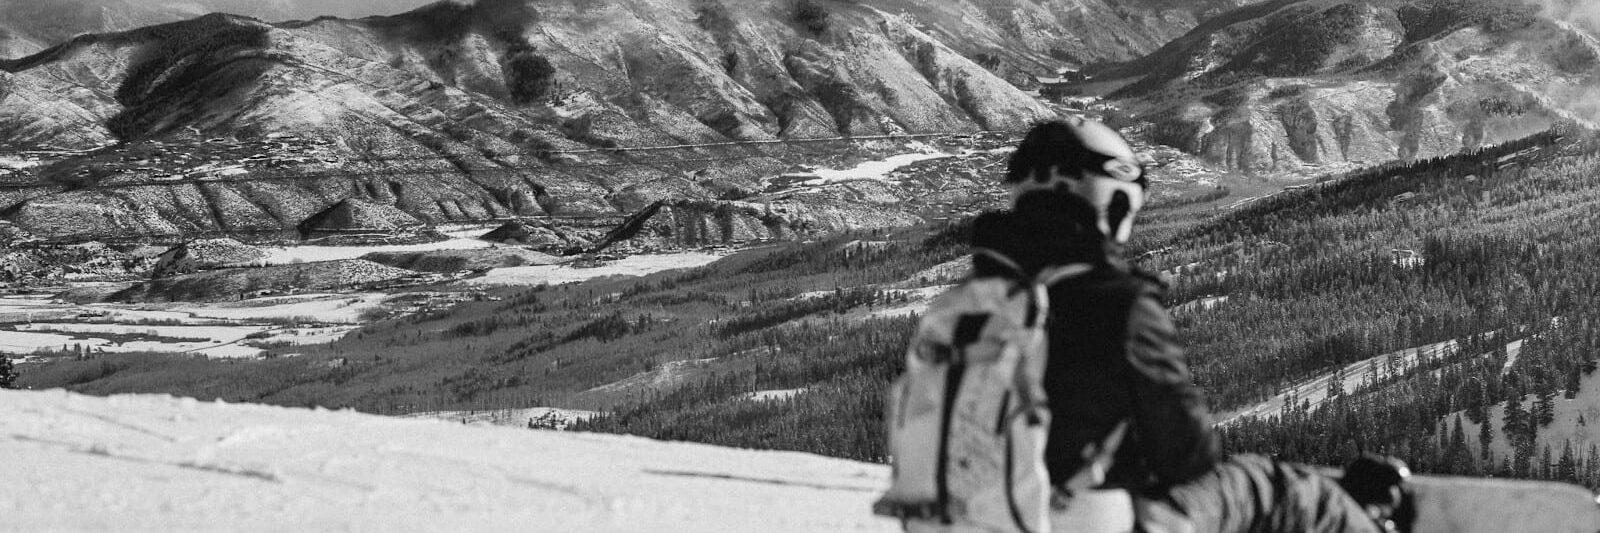 Colorado Ski Resort Snowmass Mountain Introspective